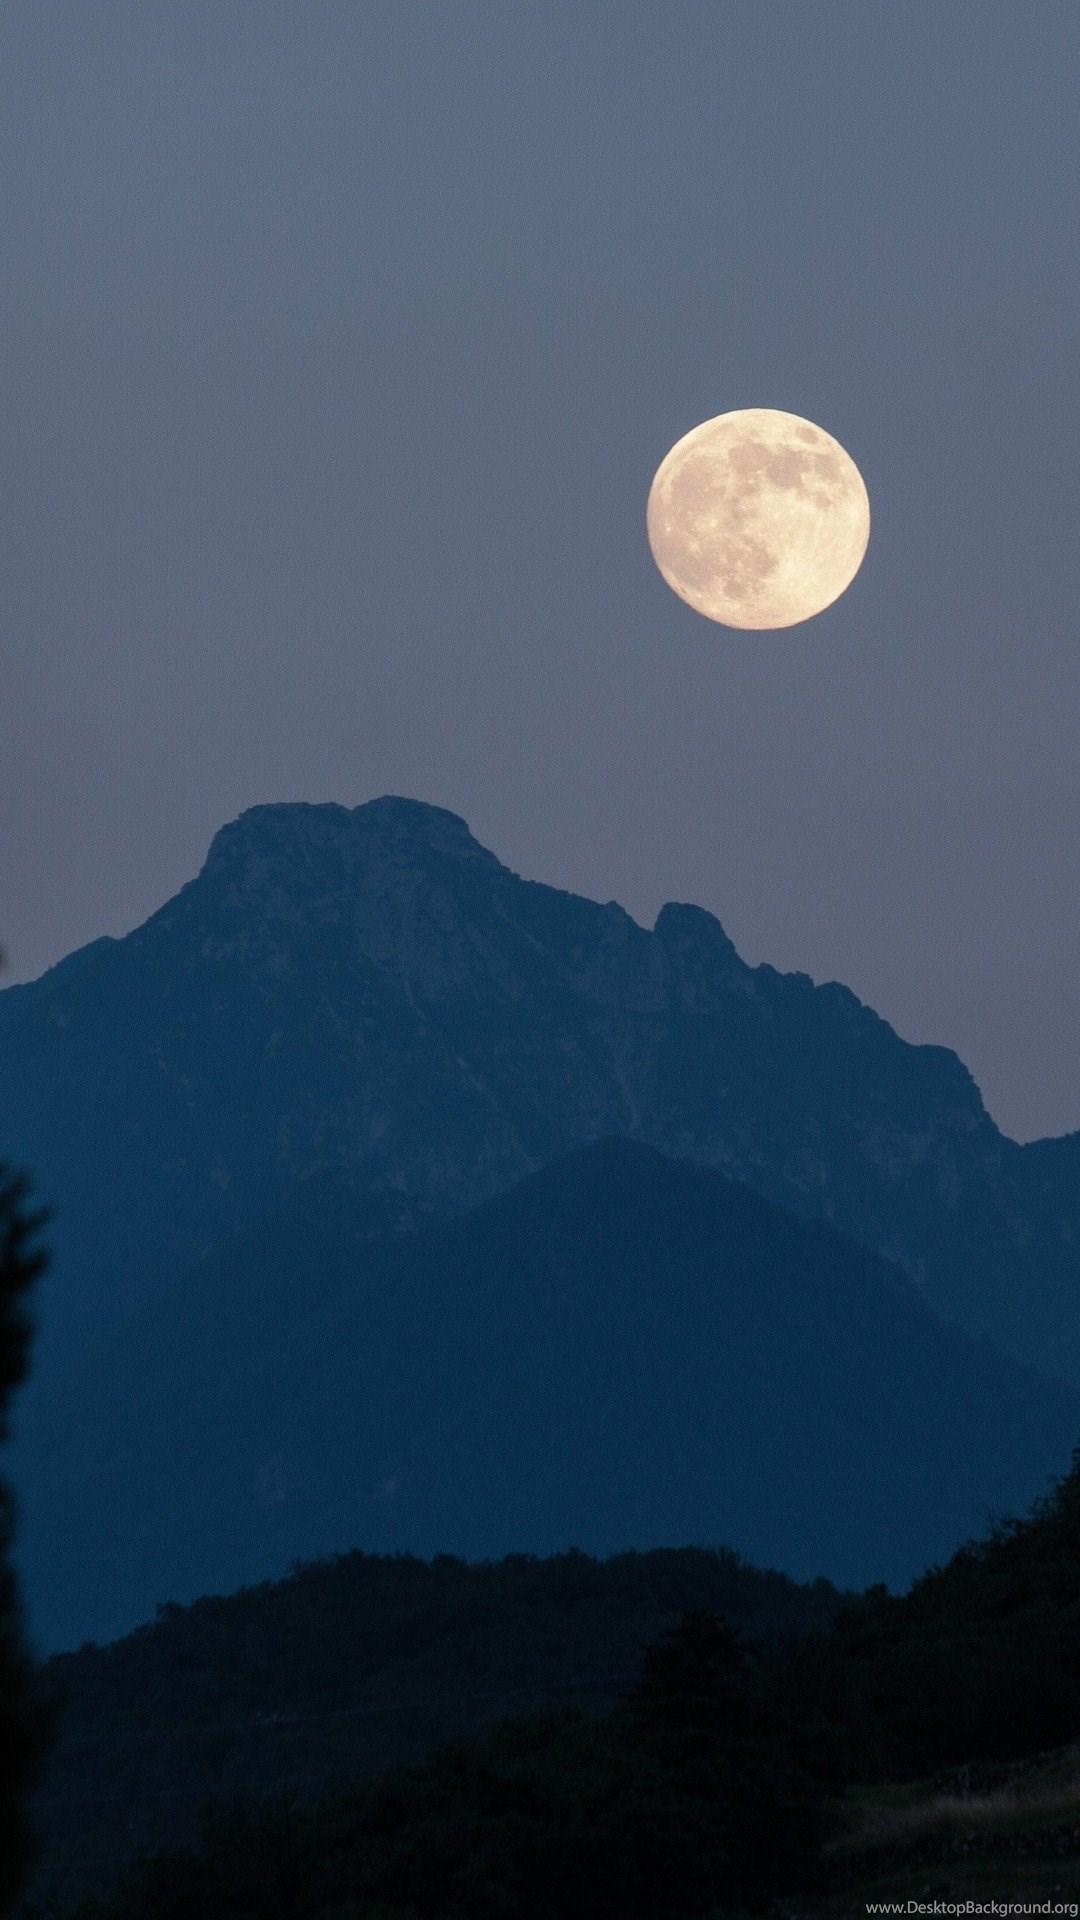 Full Moon Cypress Mountains Dark Night 4k Cool Hd Wallpapers Desktop Background